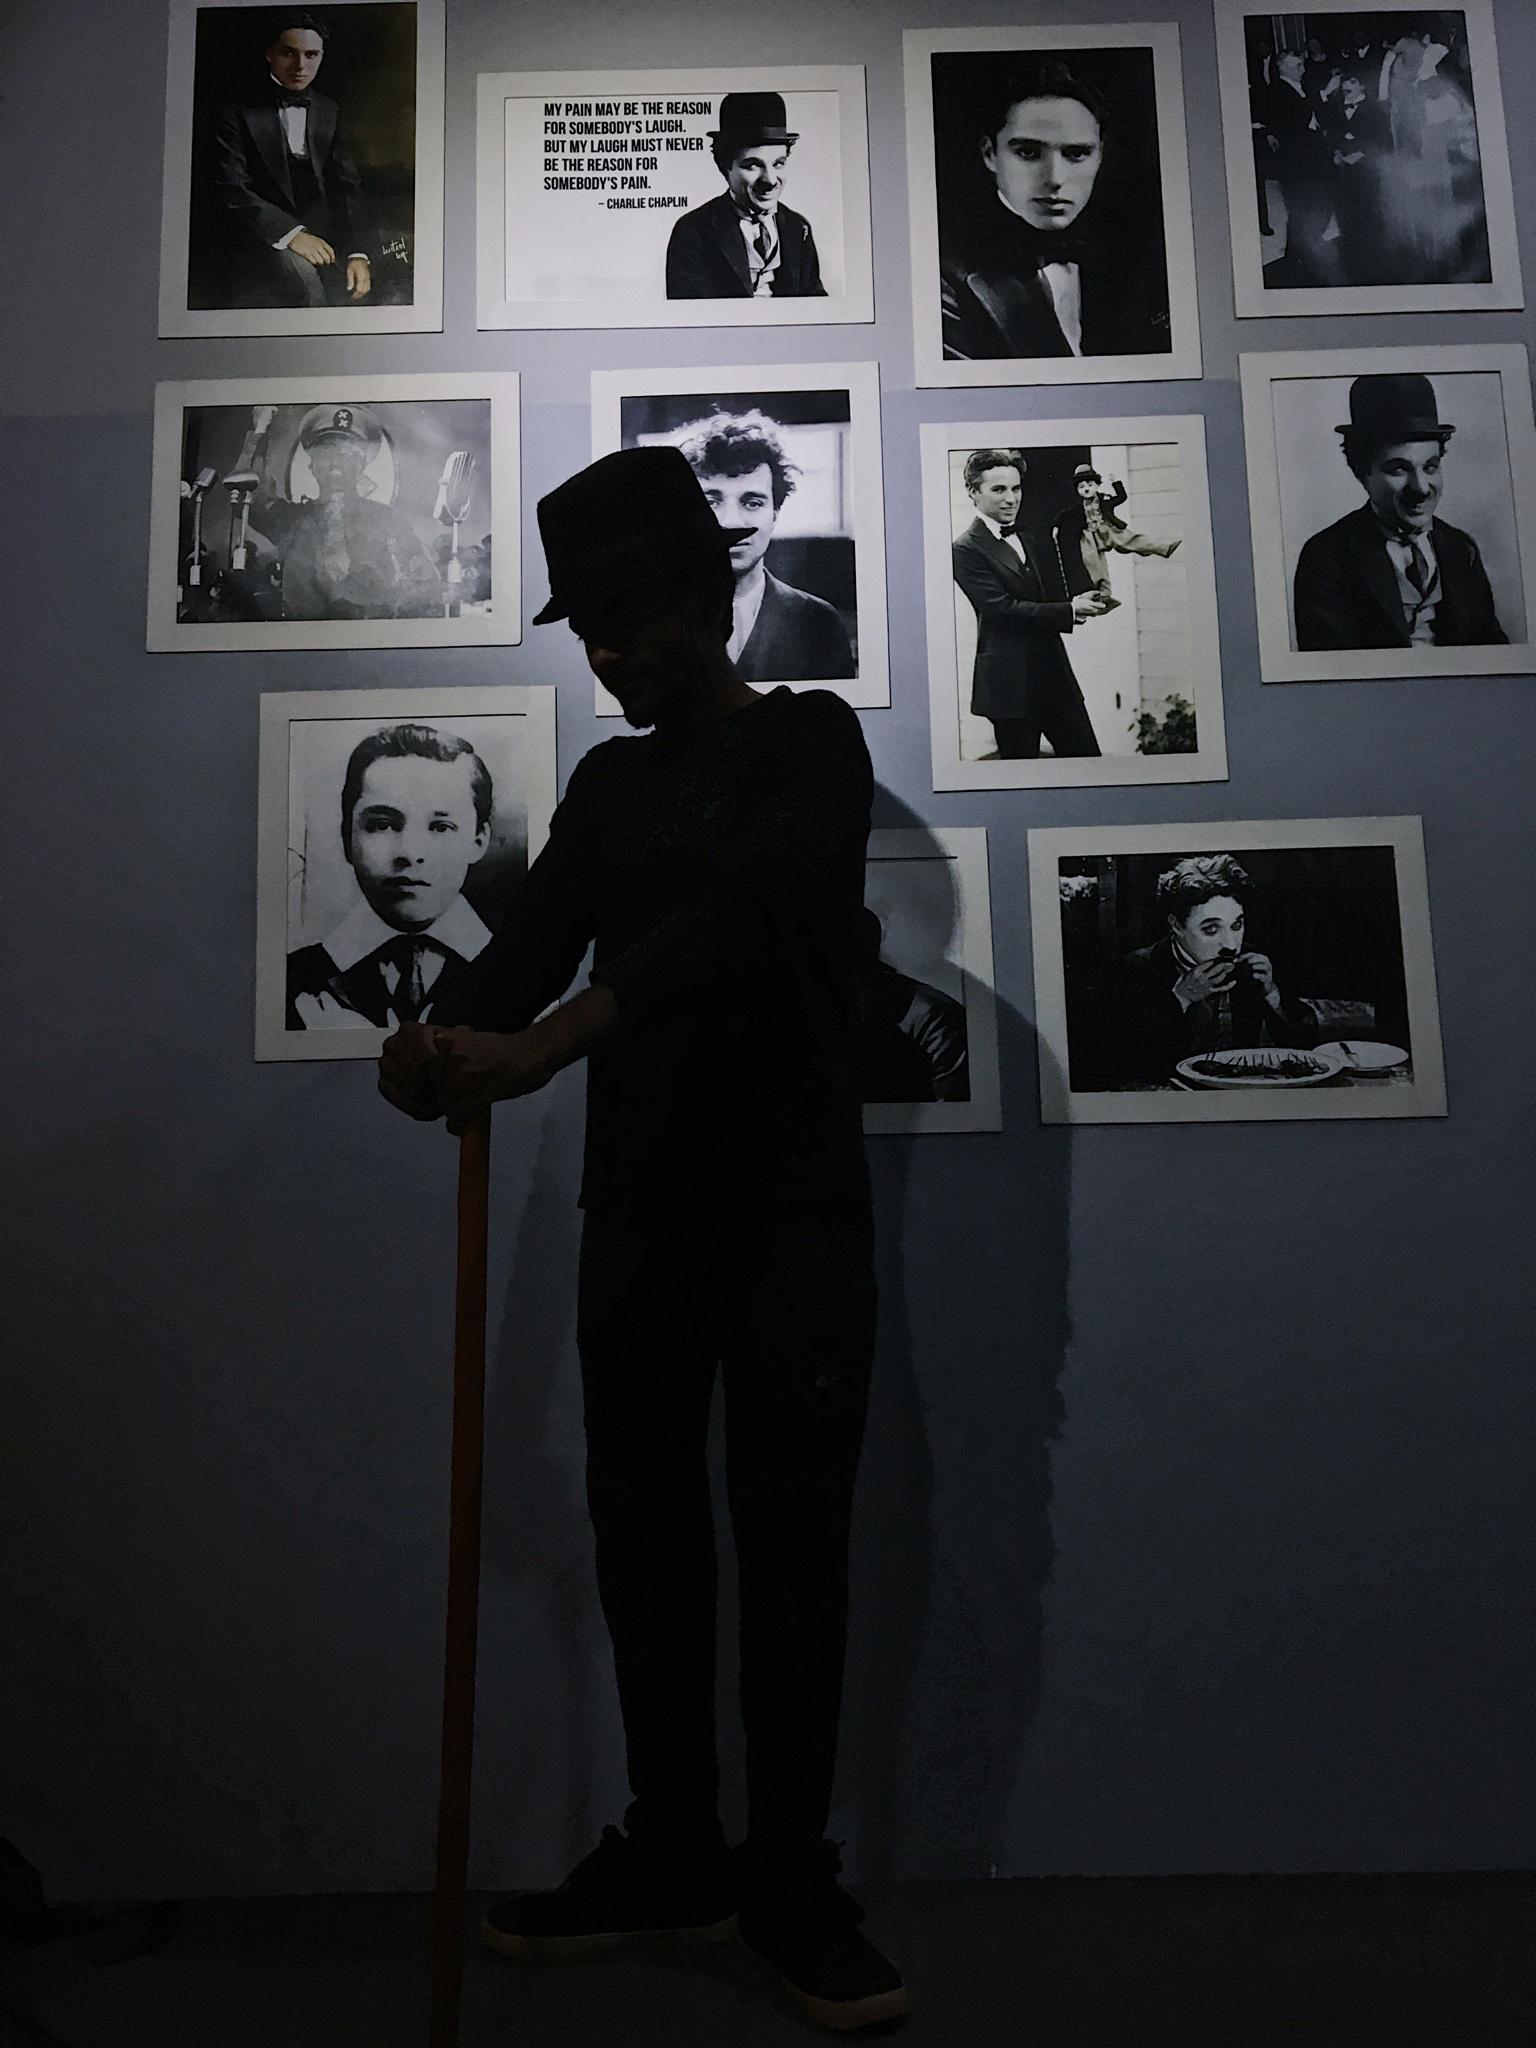 Boy posing in dark